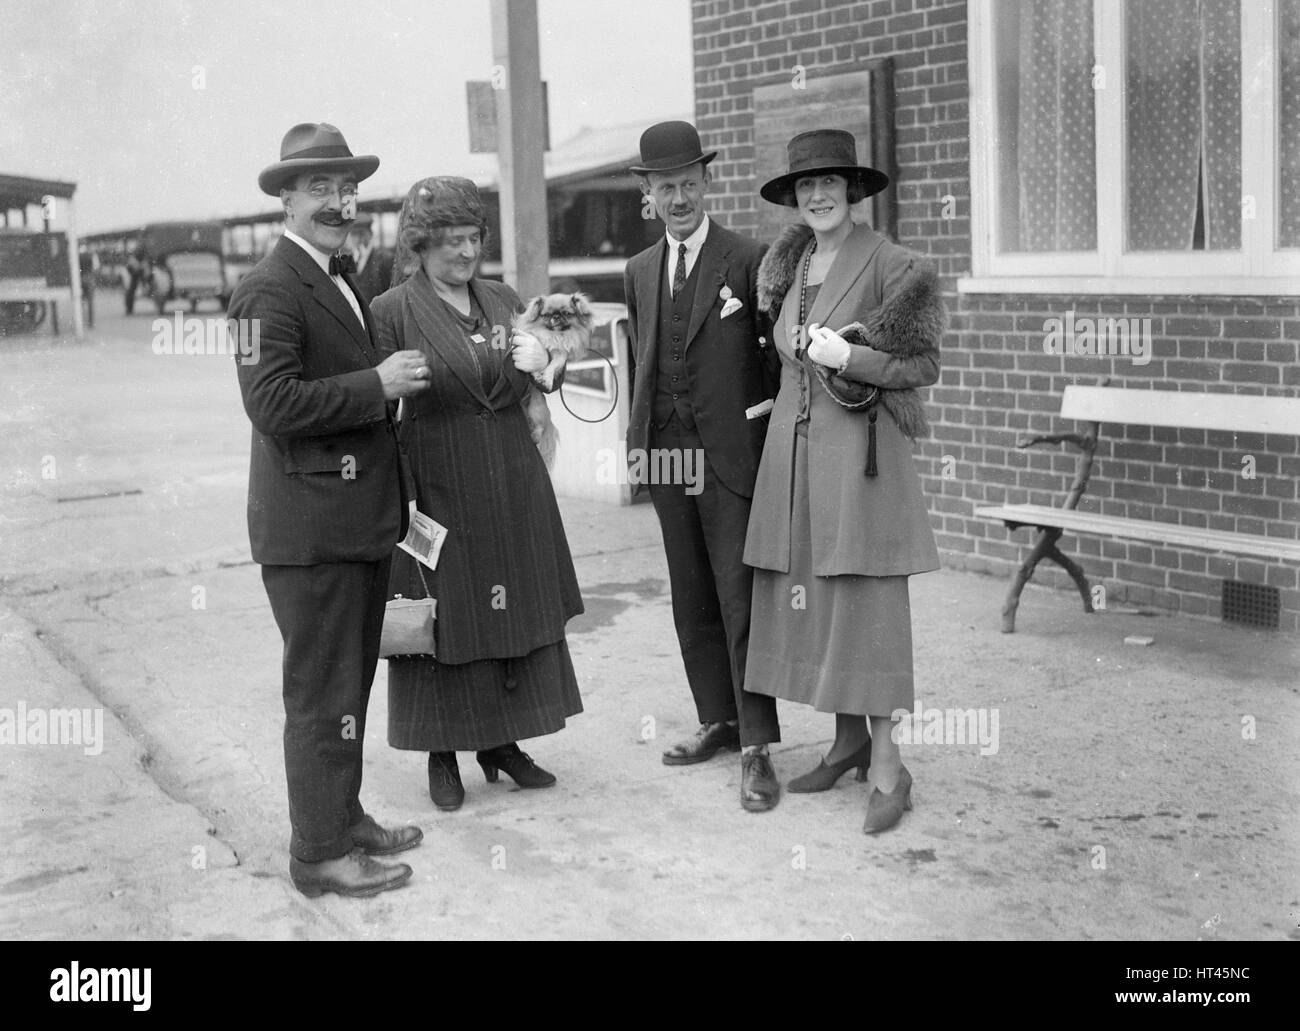 Hugh McConnell, Chief Scrutineer Brooklands Motor racing Circuit, Surrey, c1930s. Künstler: Bill Brunell. Stockbild